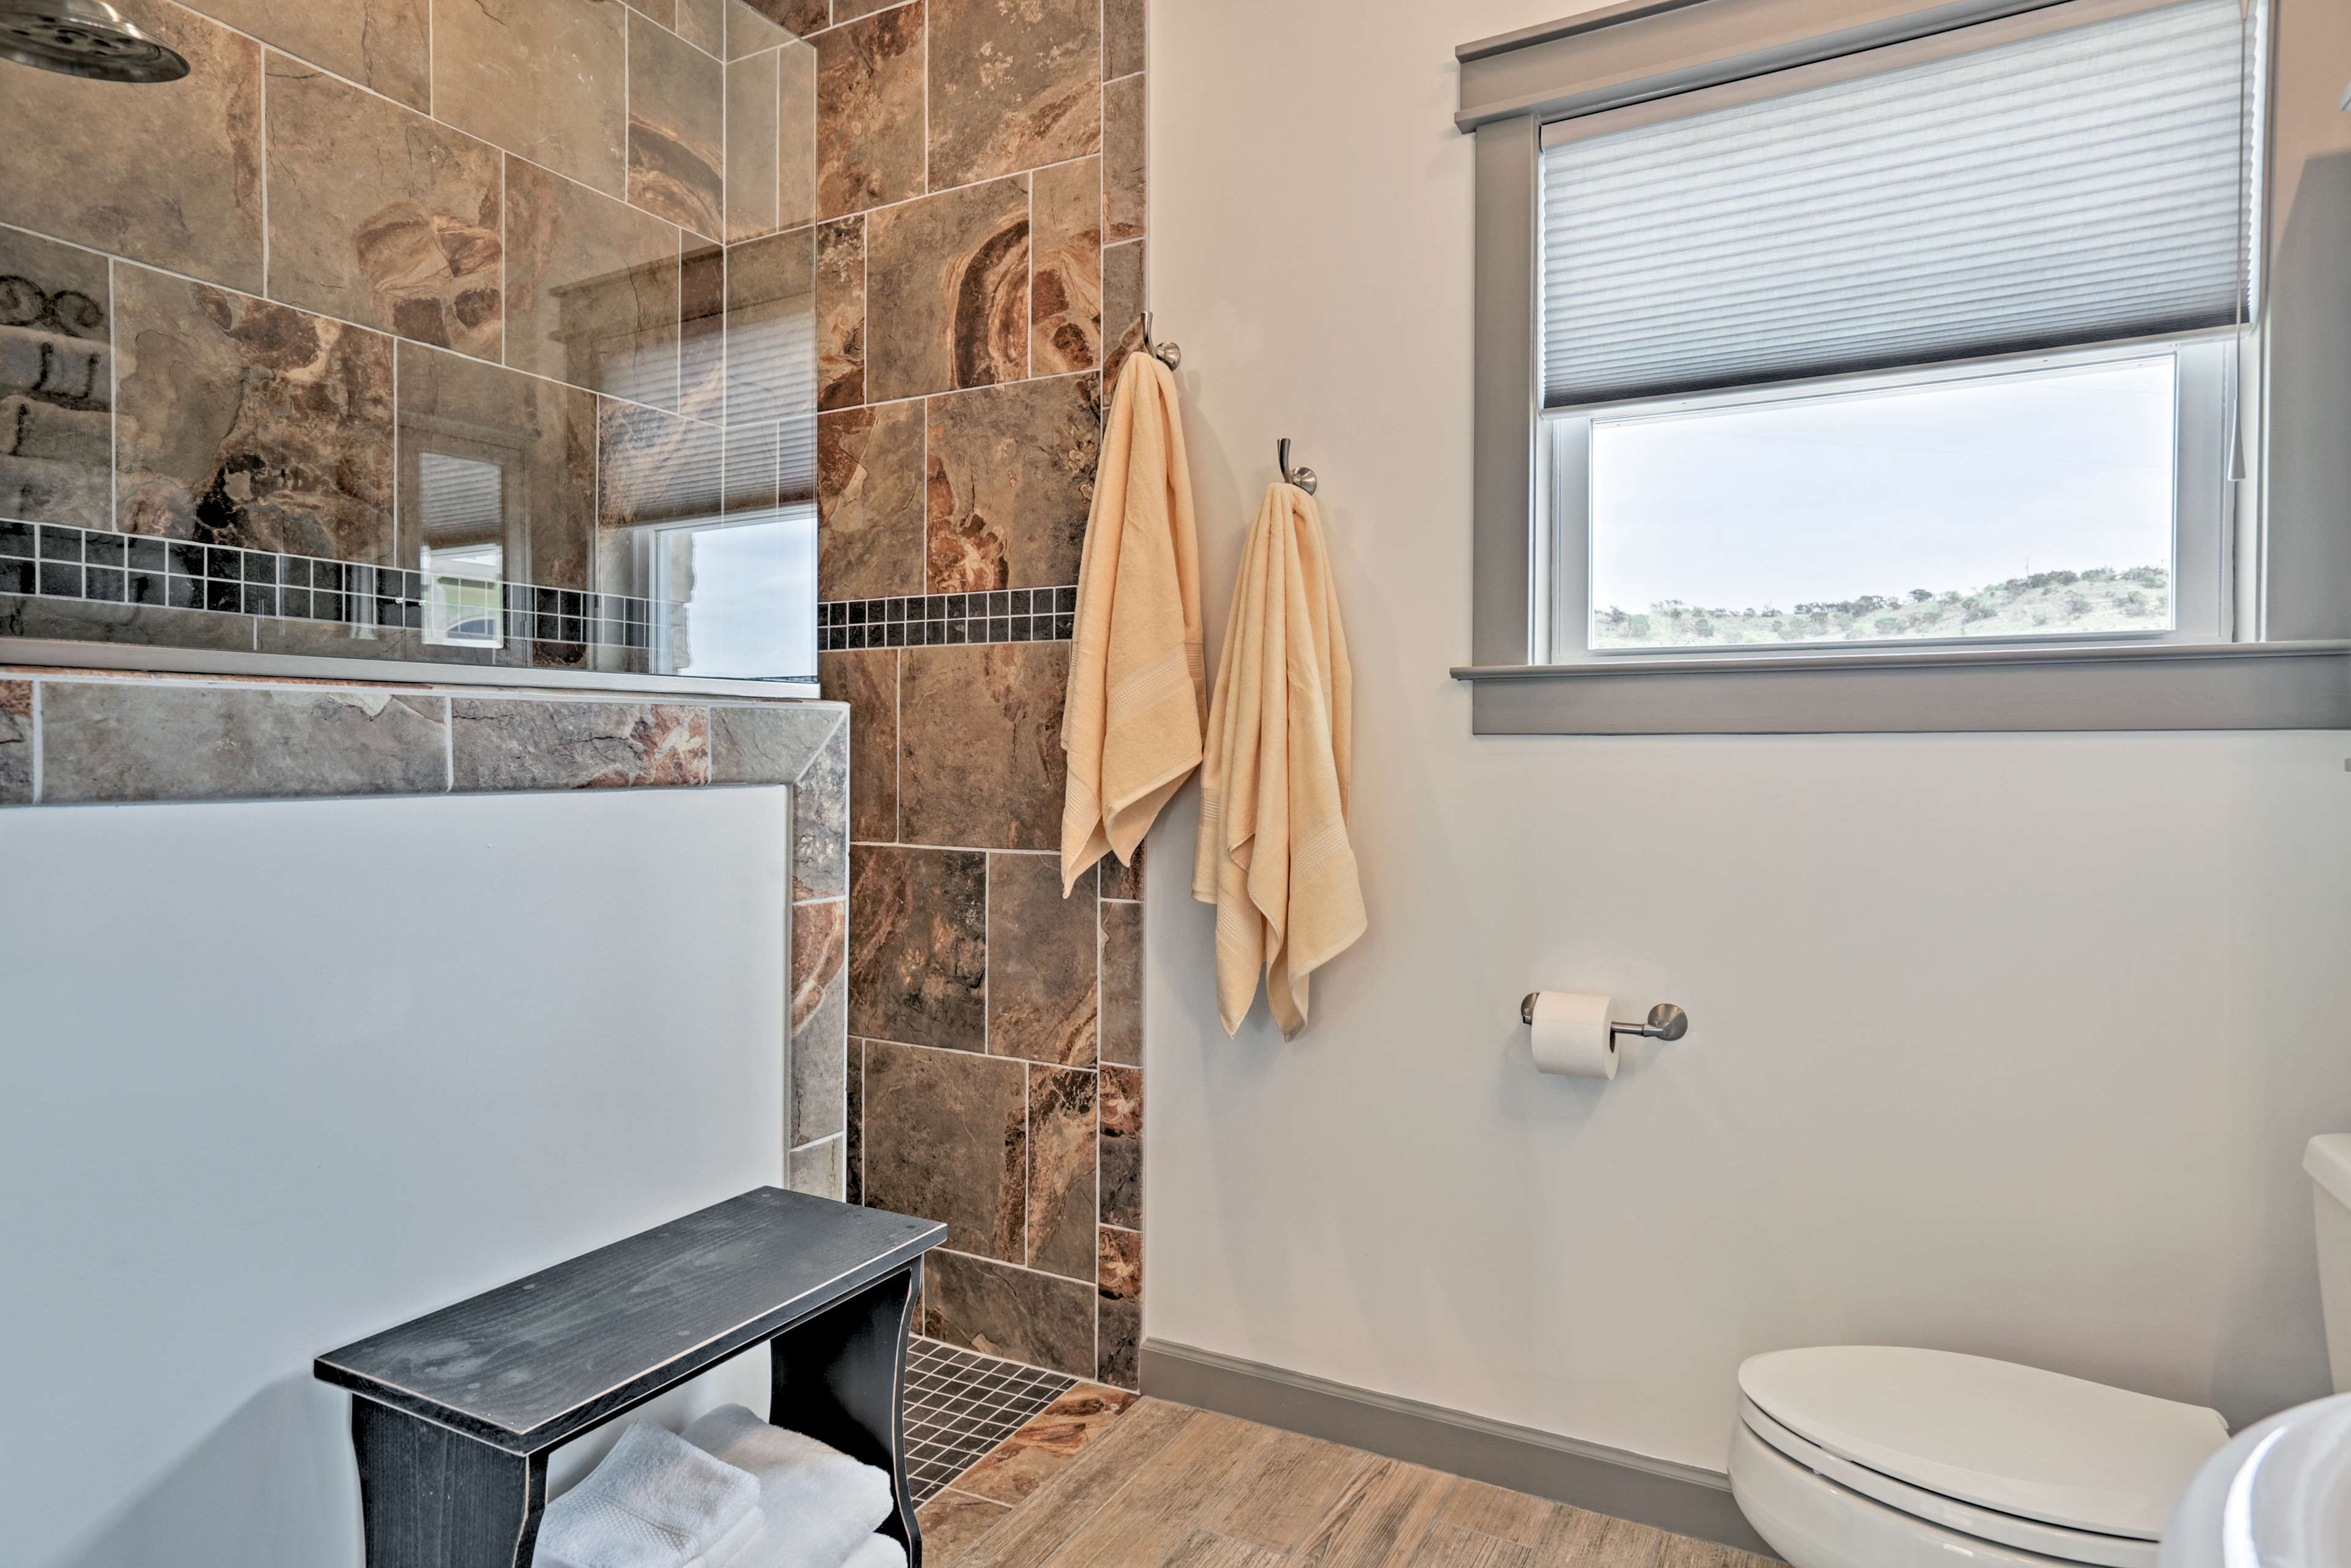 Enjoy the added luxury of a full en-suite bathroom.